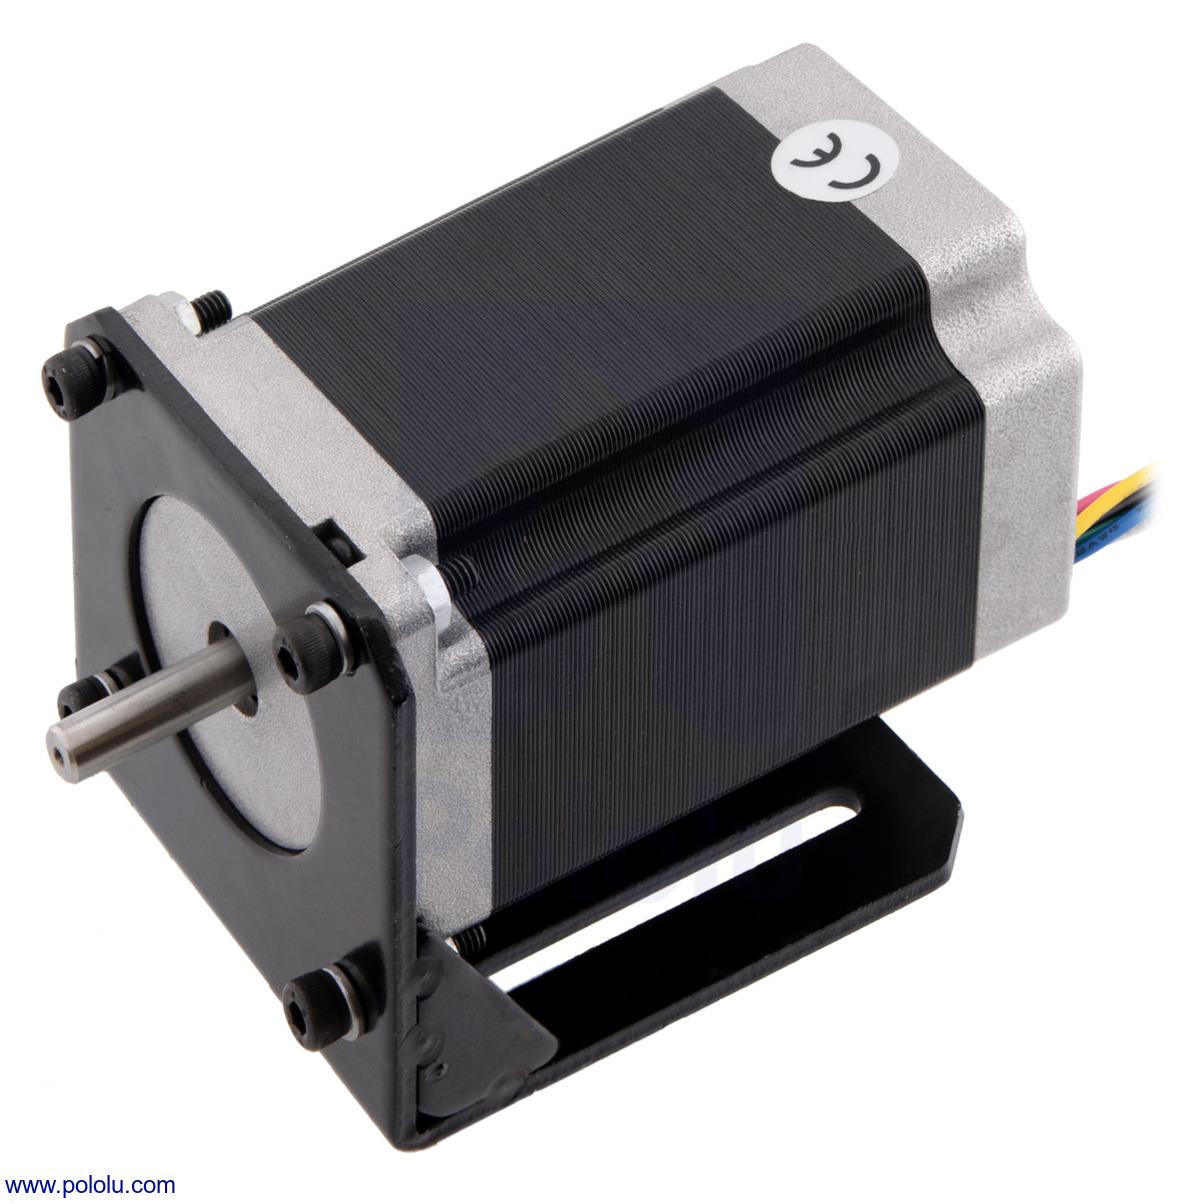 small resolution of nema 23 stepper motor item 1475 mounted with a steel l bracket for nema 23 stepper motors